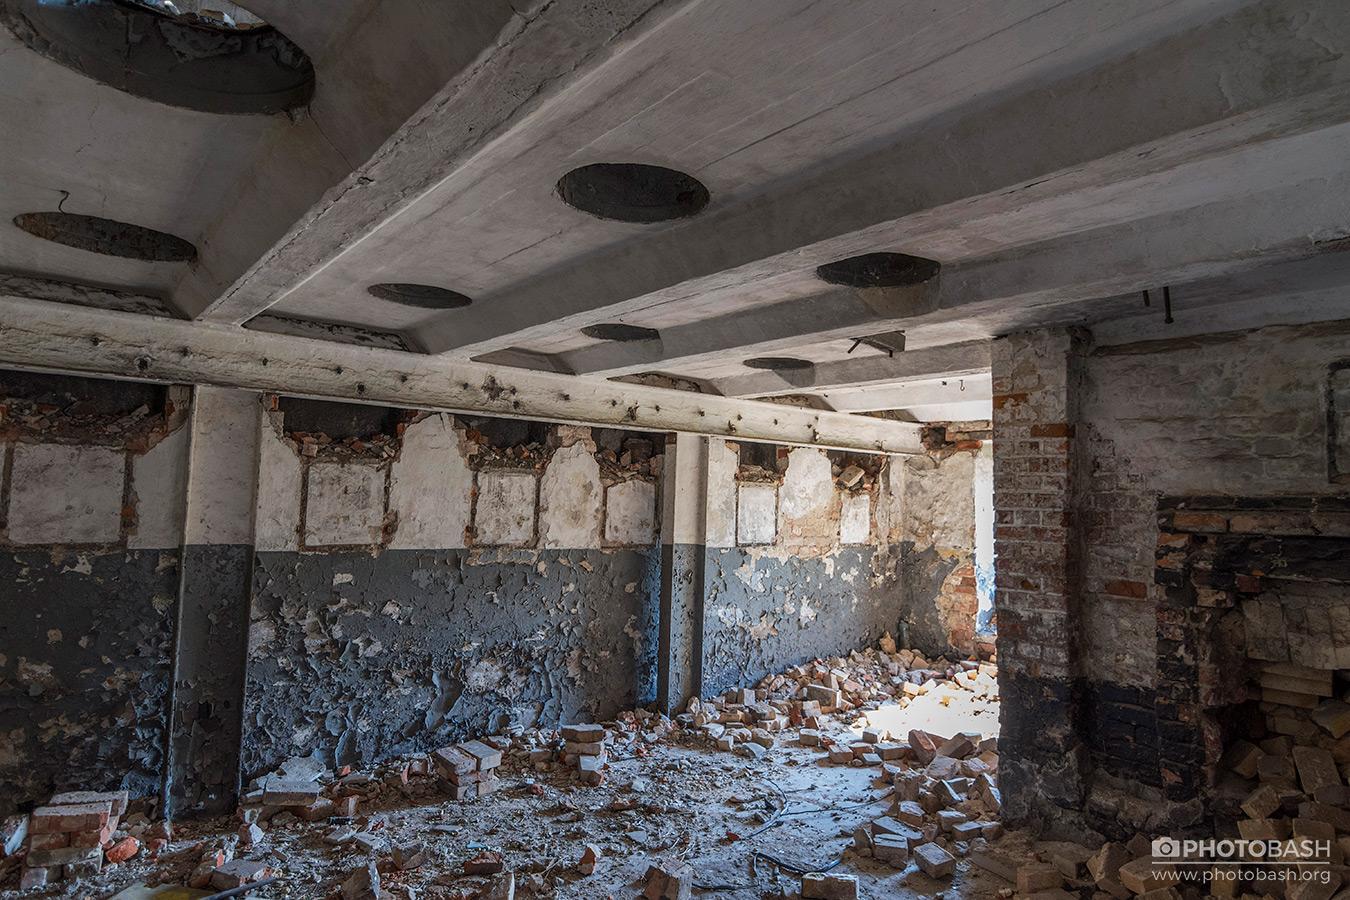 Abandoned-Interiors-Urban-Exploration.jpg